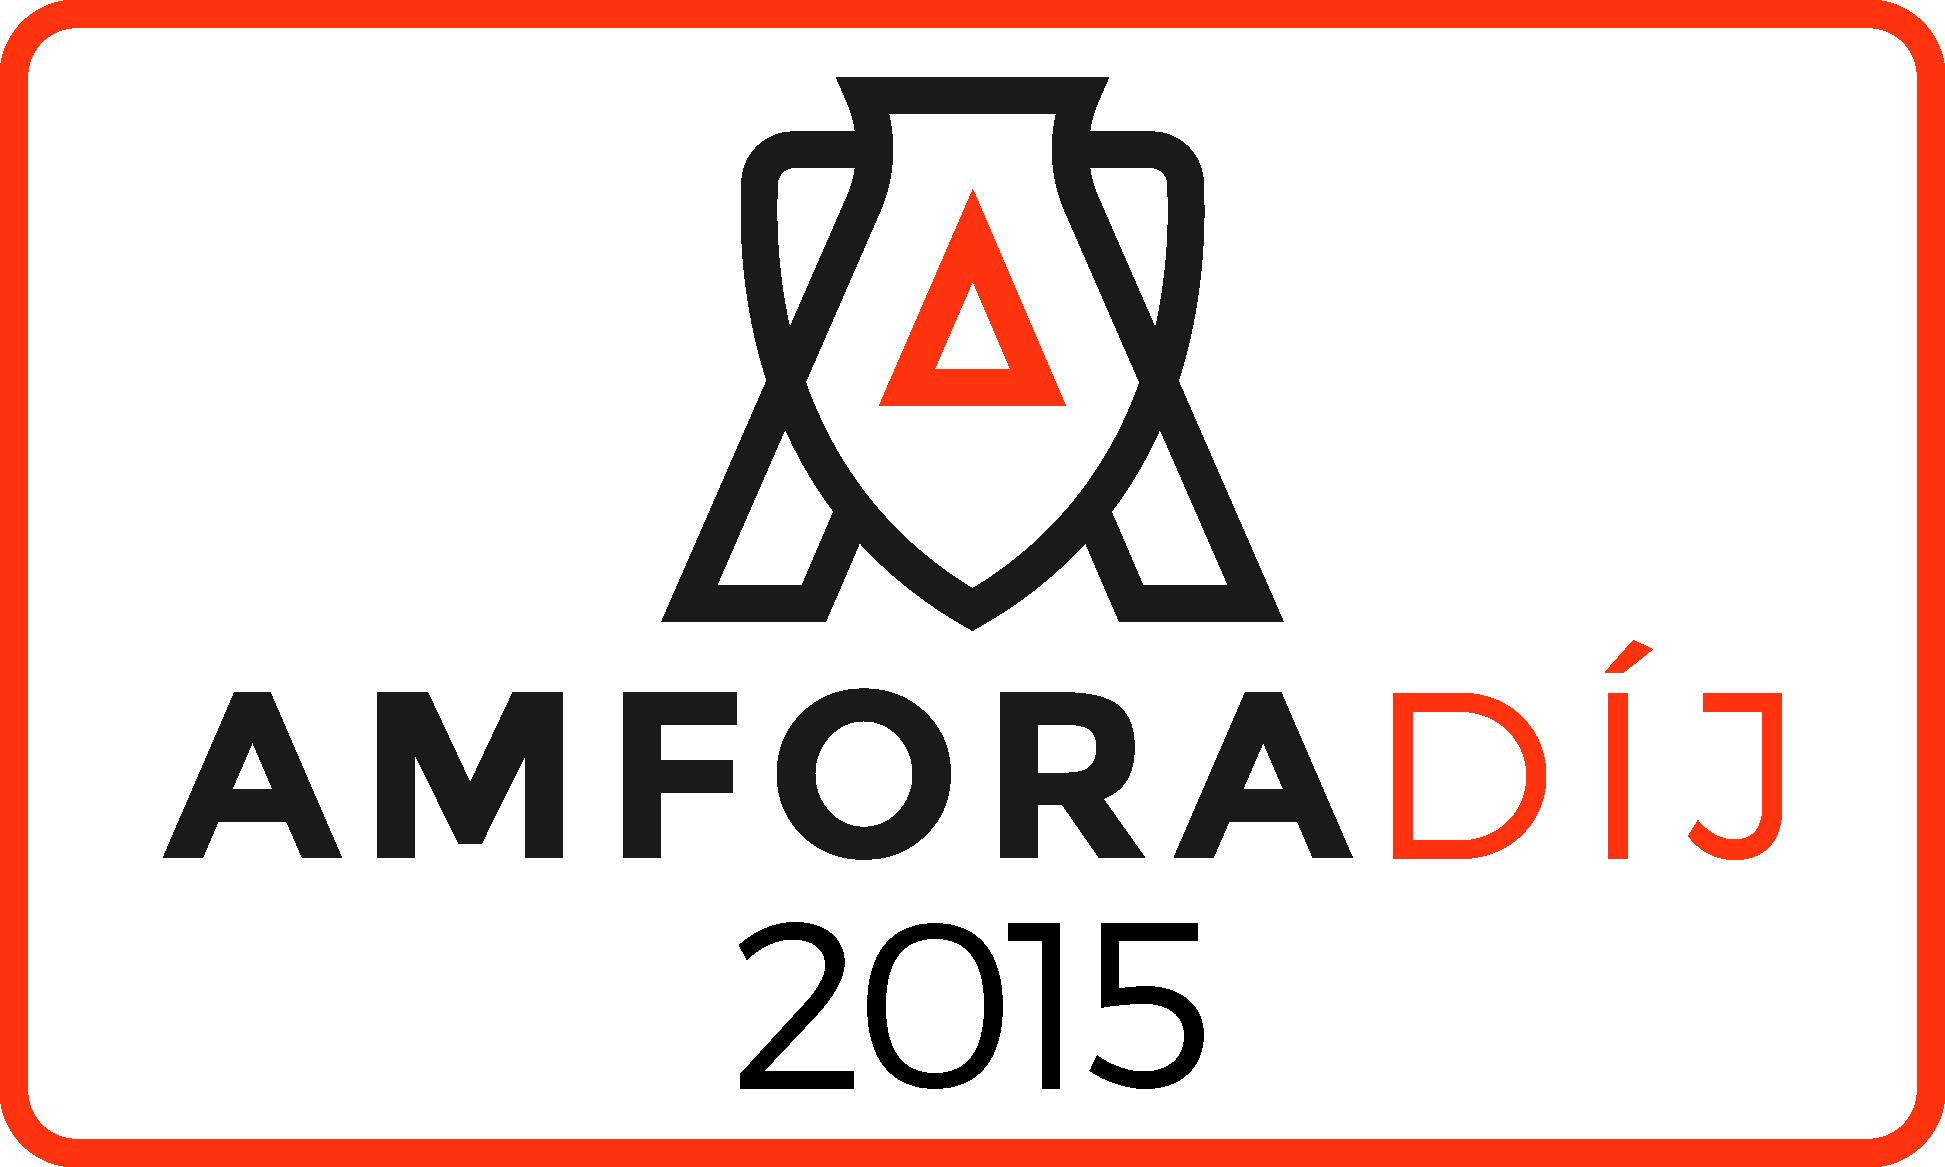 Amfora-Dij-2015-badge-2016-01-13_Oldal_7